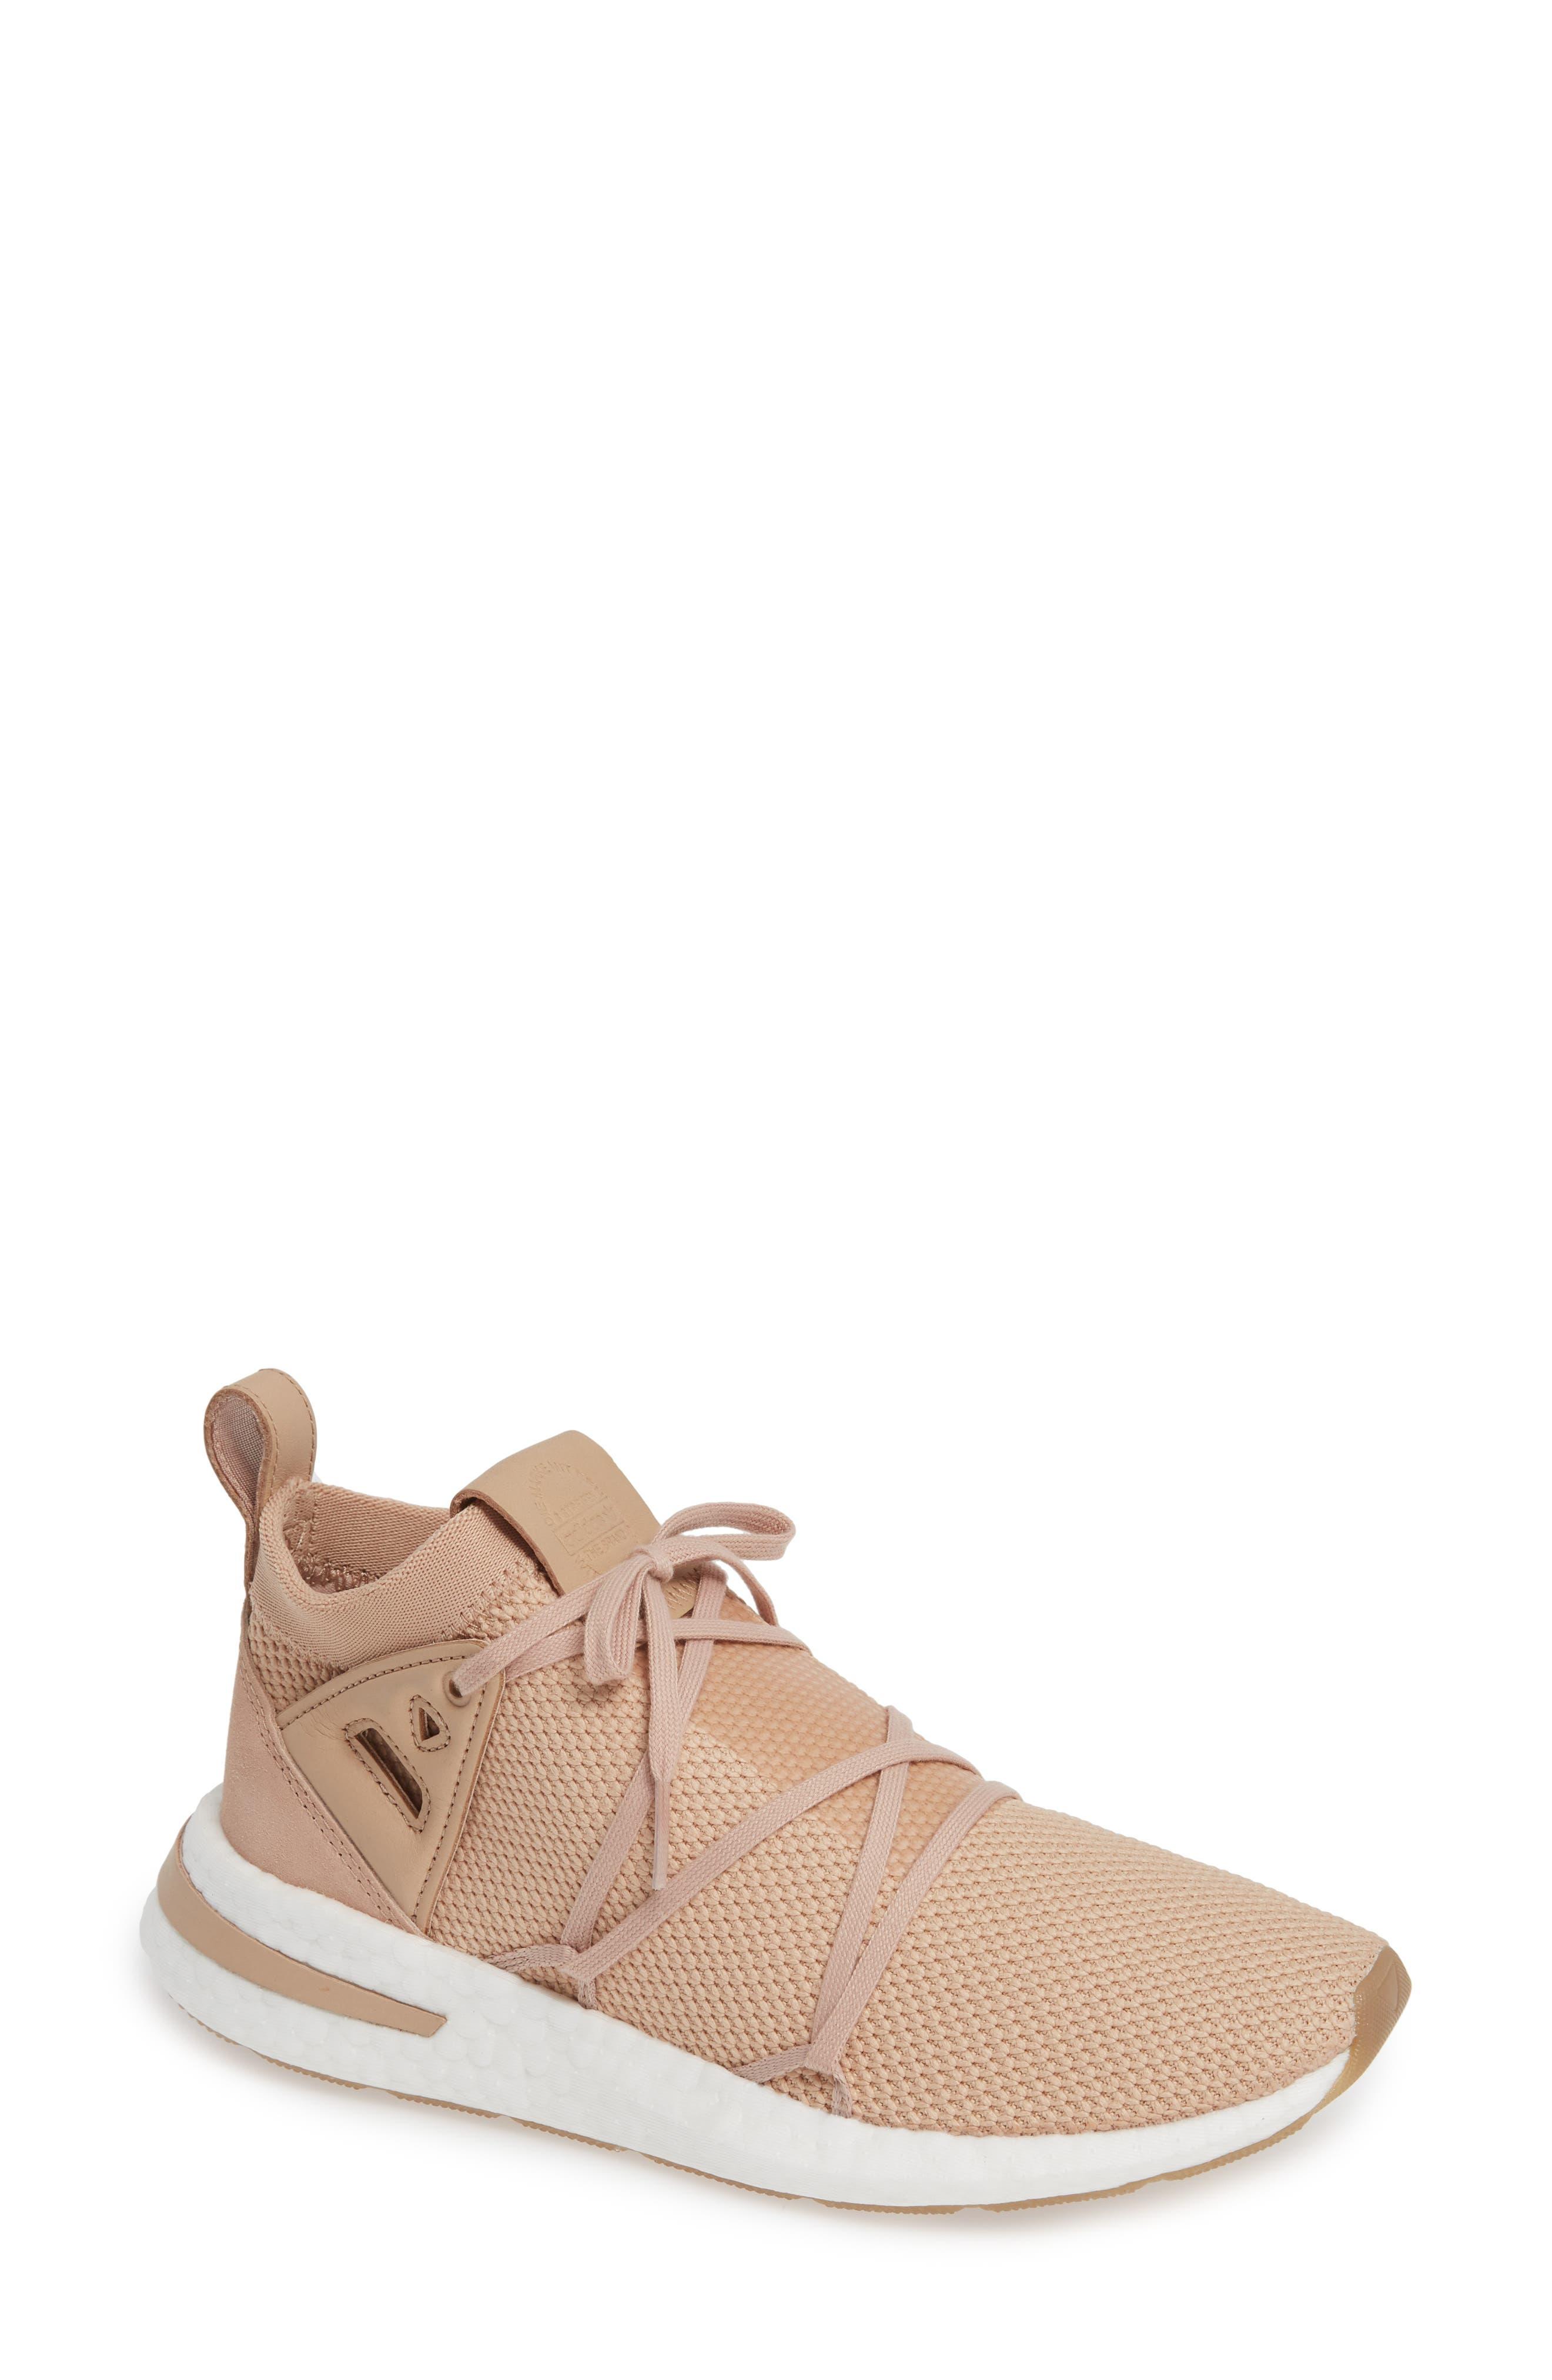 ,                             Arkyn Primeknit Sneaker,                             Main thumbnail 31, color,                             250